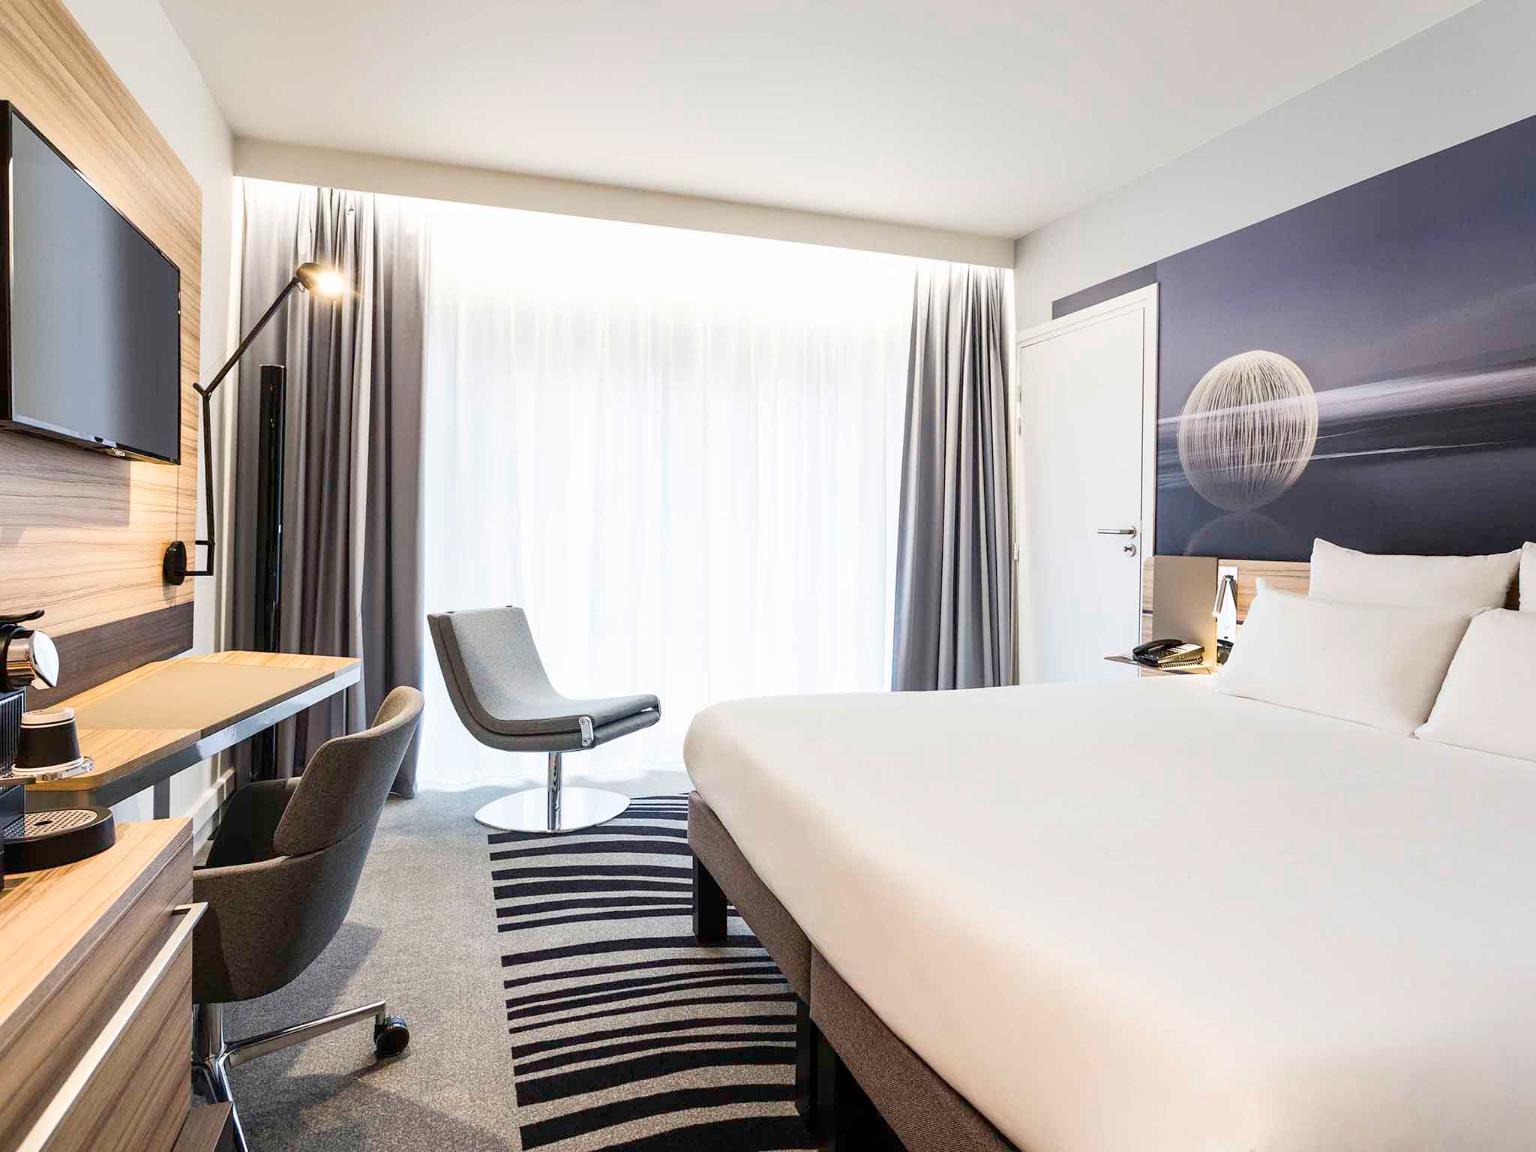 Novotel resort spa biarritz anglet h tel 68 avenue d for Chambre de l assurance